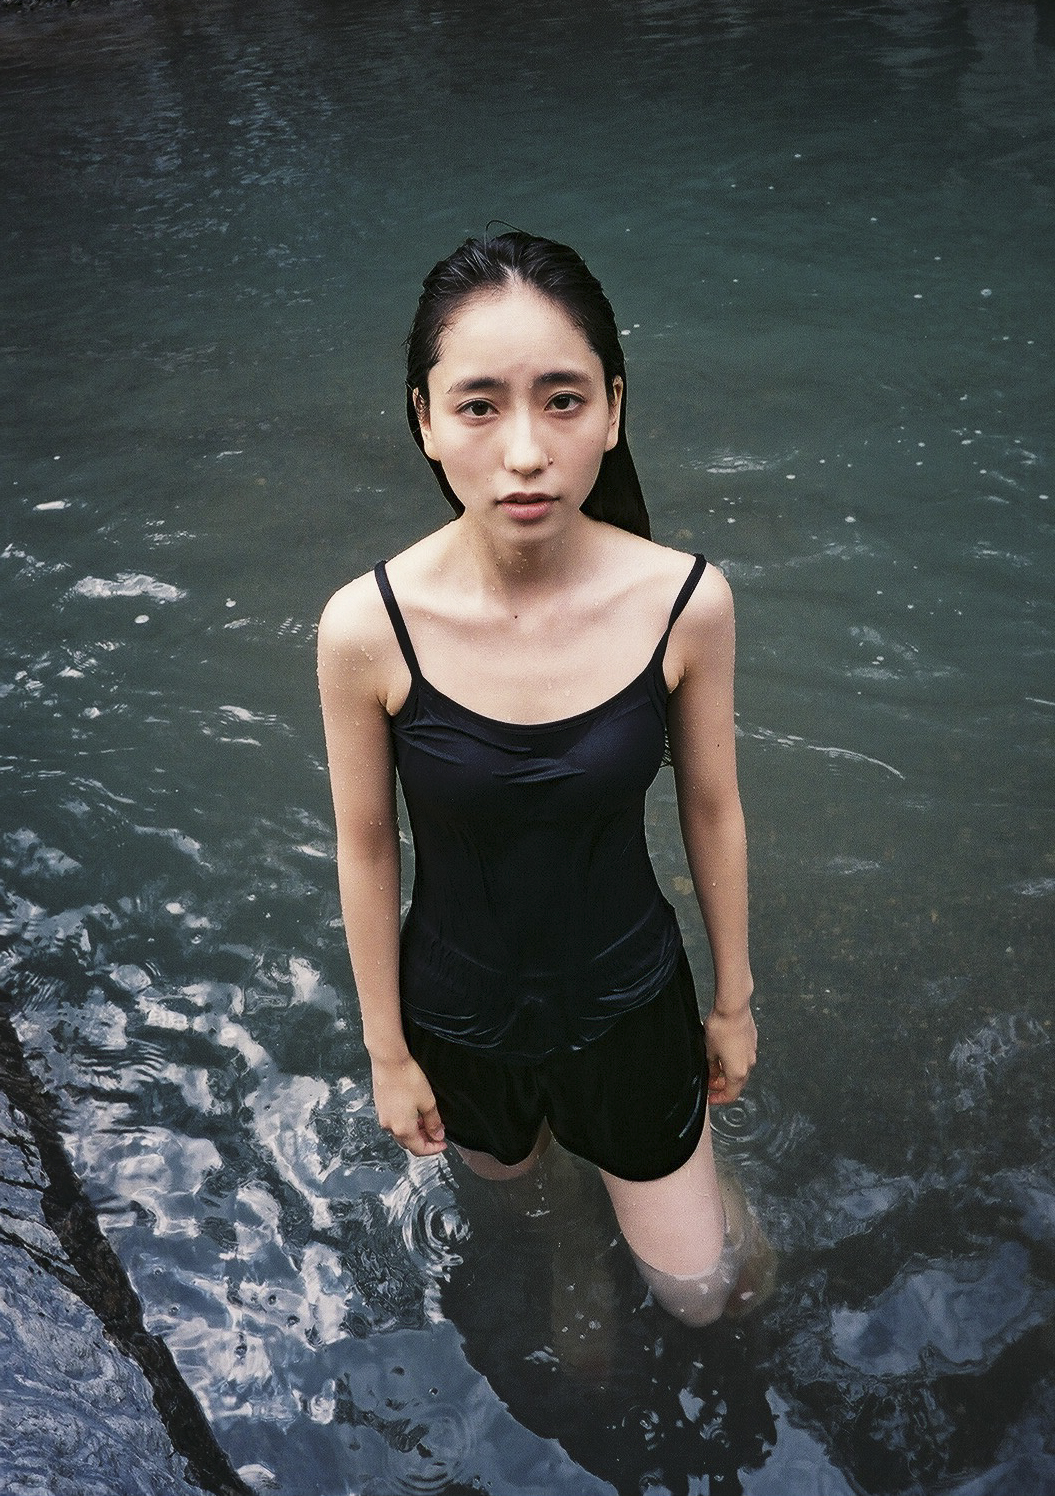 Misaki Hattori / 服部 美咲